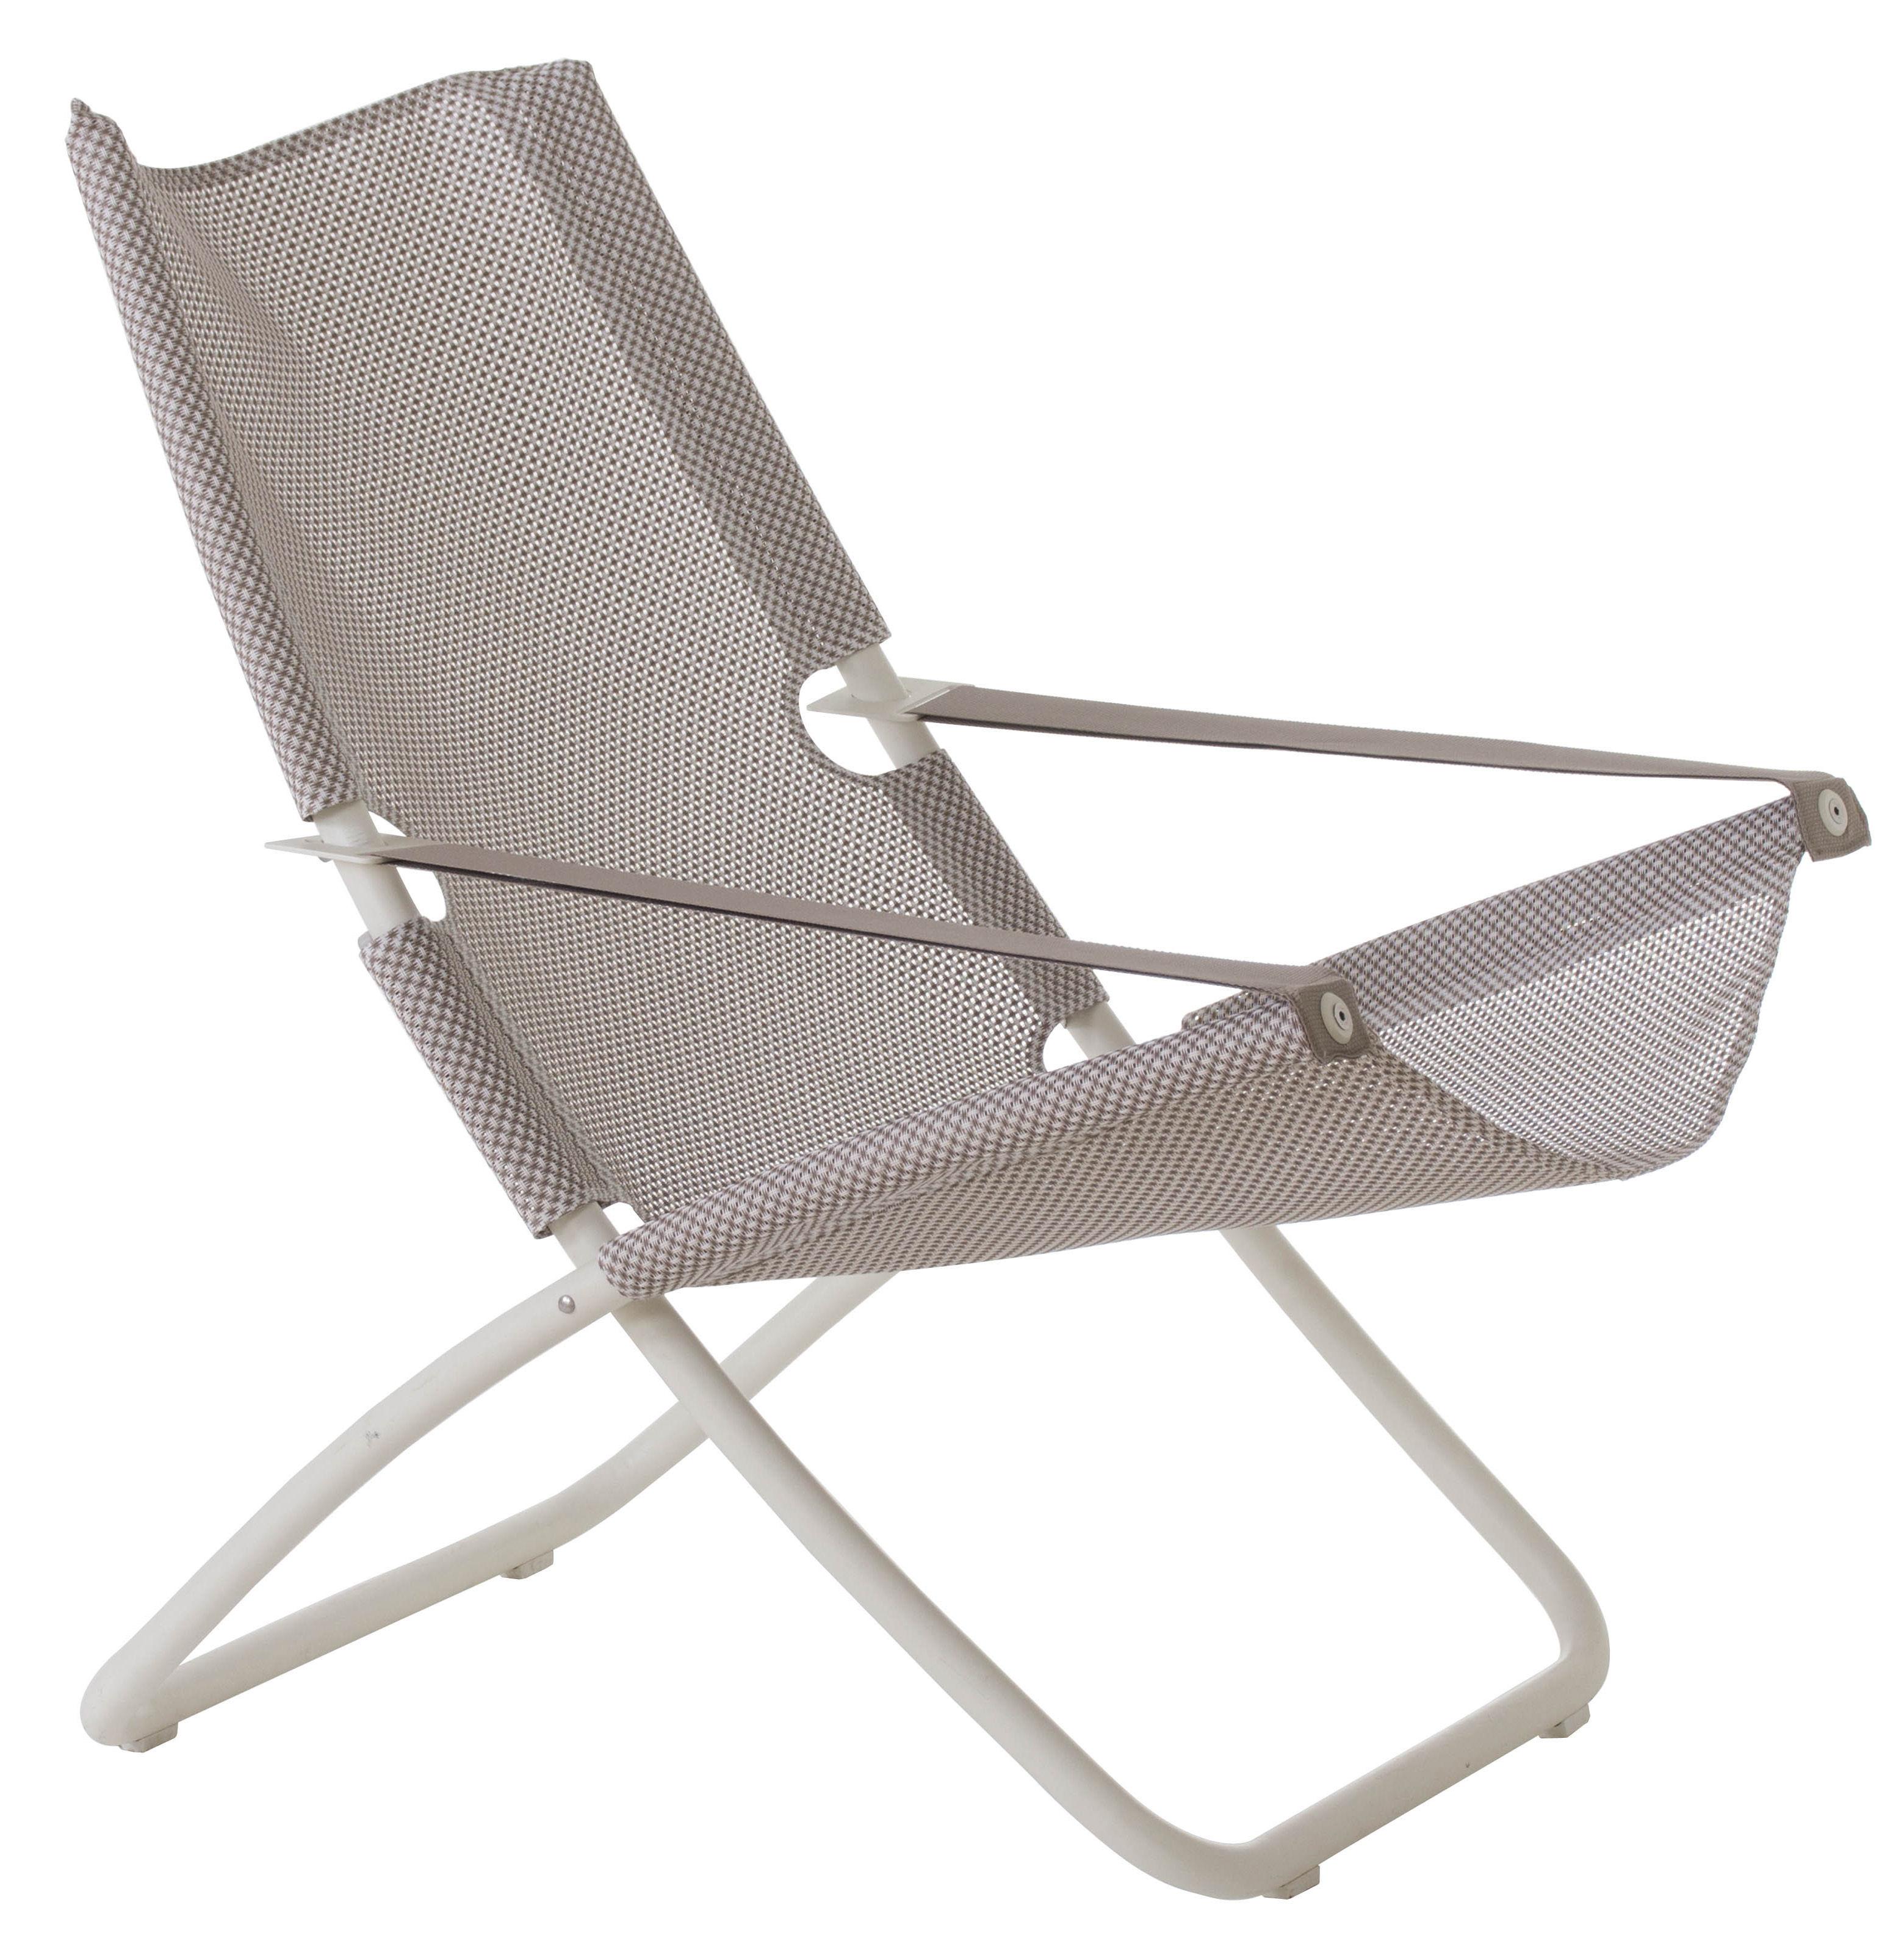 Outdoor - Poltrone - Chaise longue Snooze di Emu - Bianco - Acciaio, Tessuto